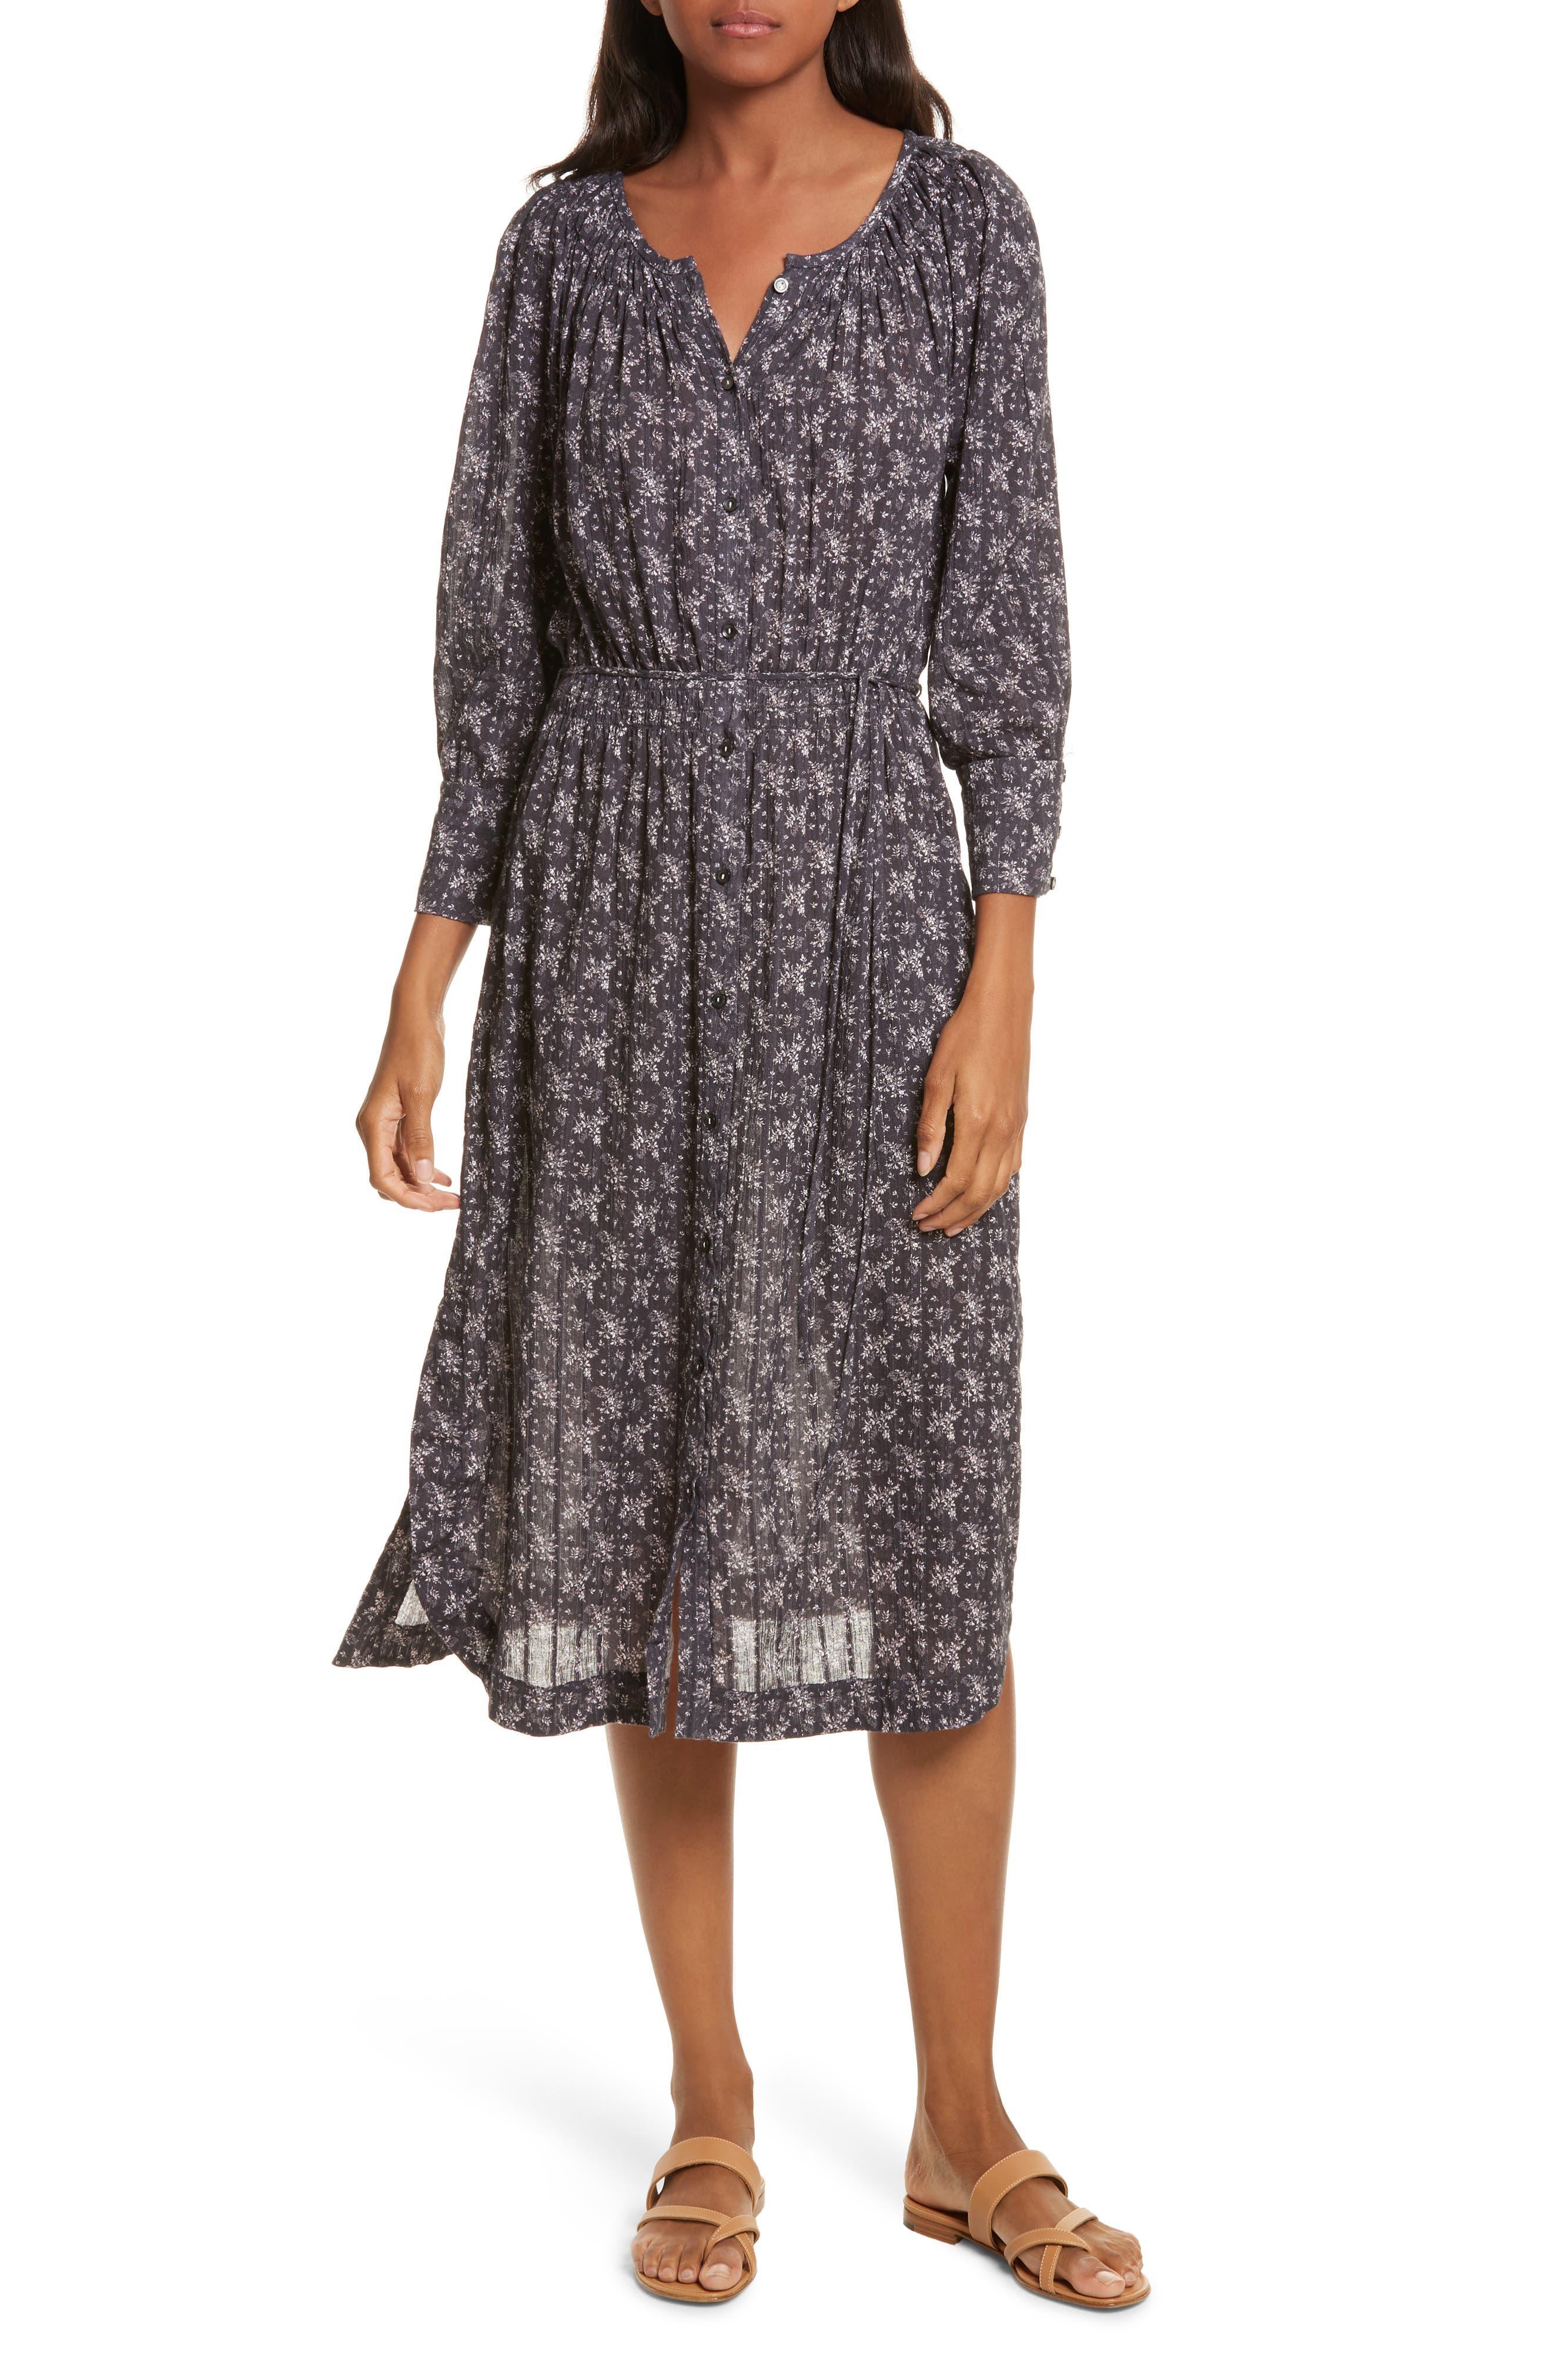 Angelique Long Sleeve Dress,                             Main thumbnail 1, color,                             014